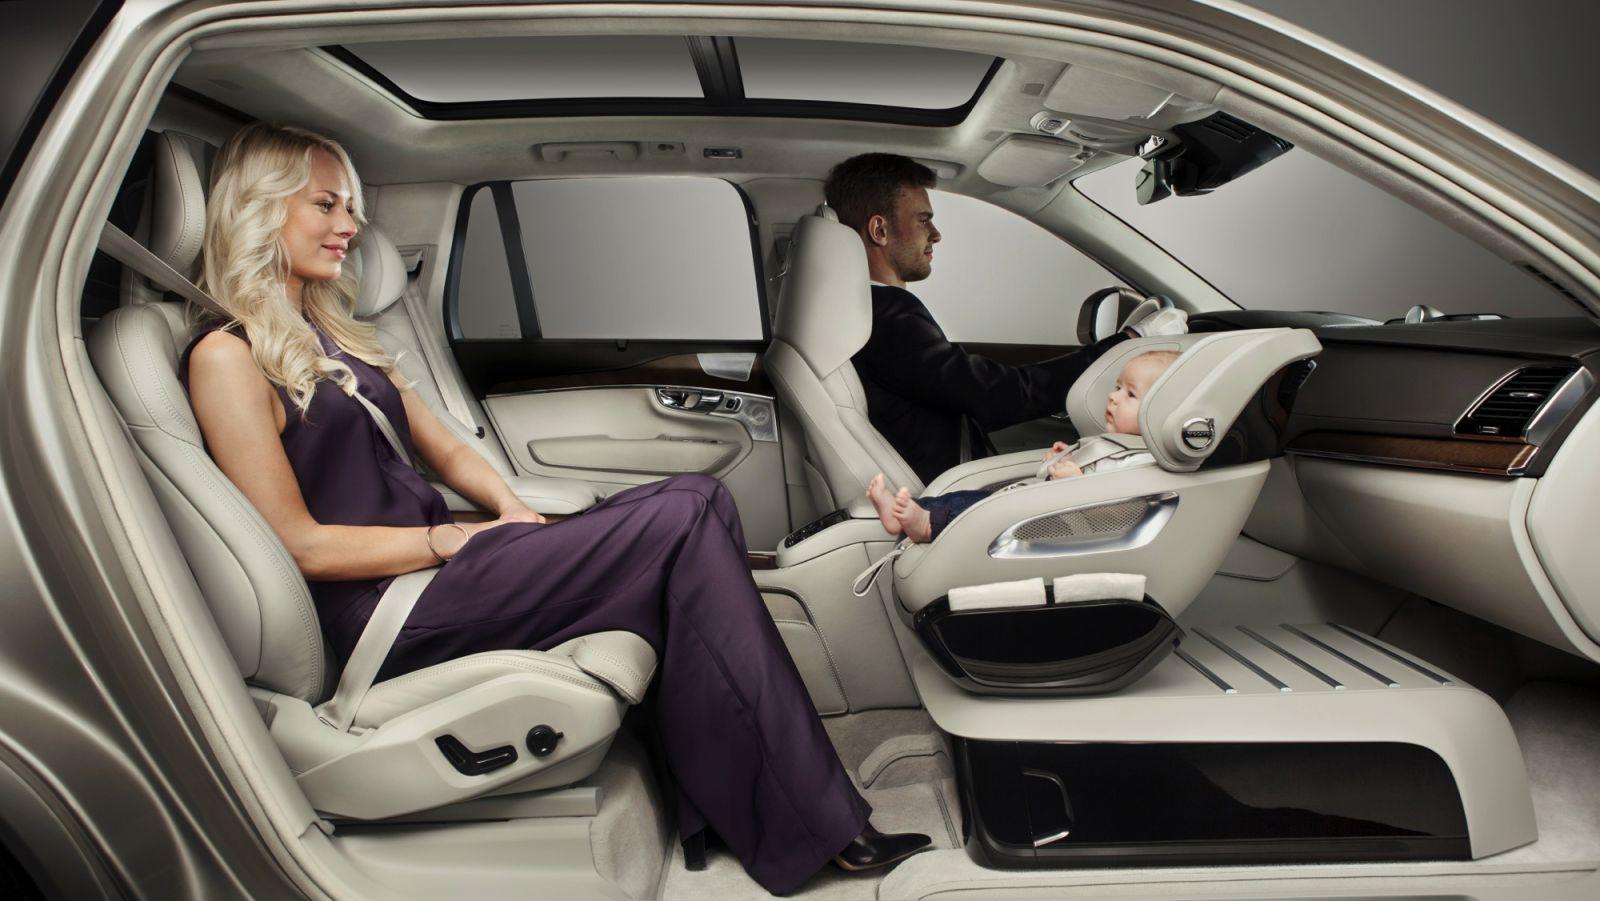 volvo baby seat Τα 10 καλύτερα αυτοκίνητα για νέες μαμάδες topspeed.gr, zblog, μαμάδες, μητέρες, μωρά